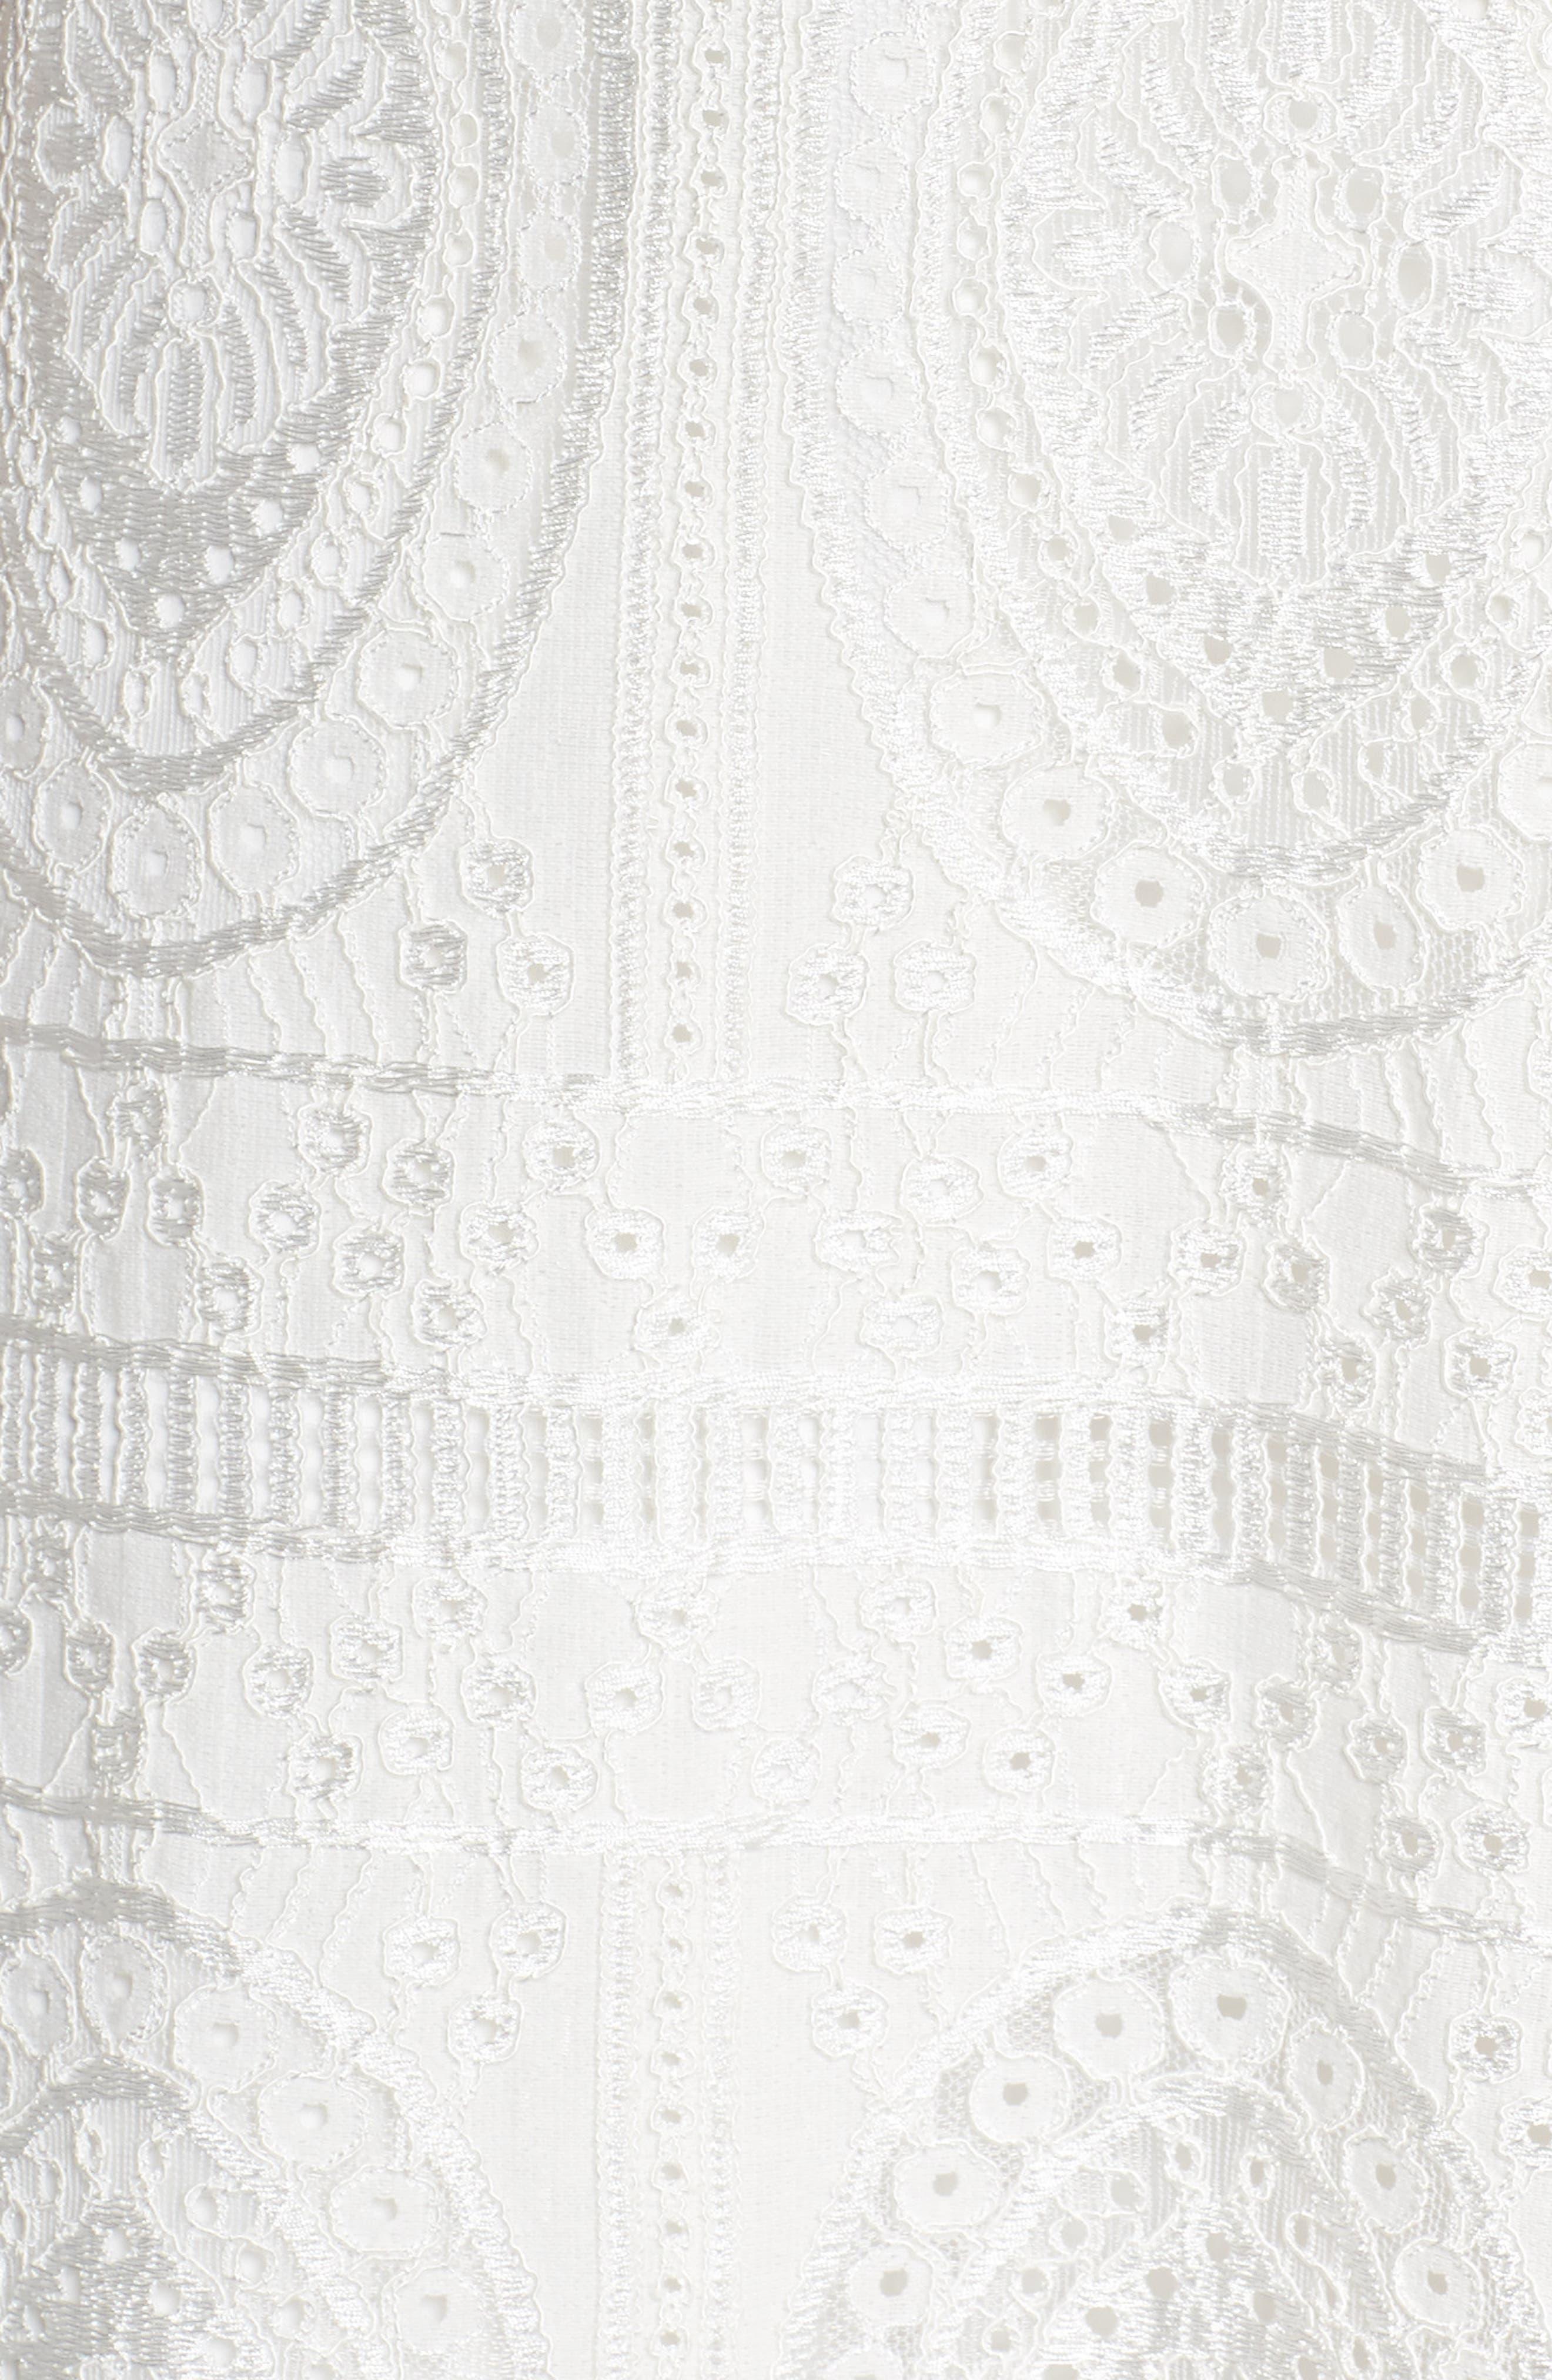 Lace Off the Shoulder Maxi Dress,                             Alternate thumbnail 5, color,                             900